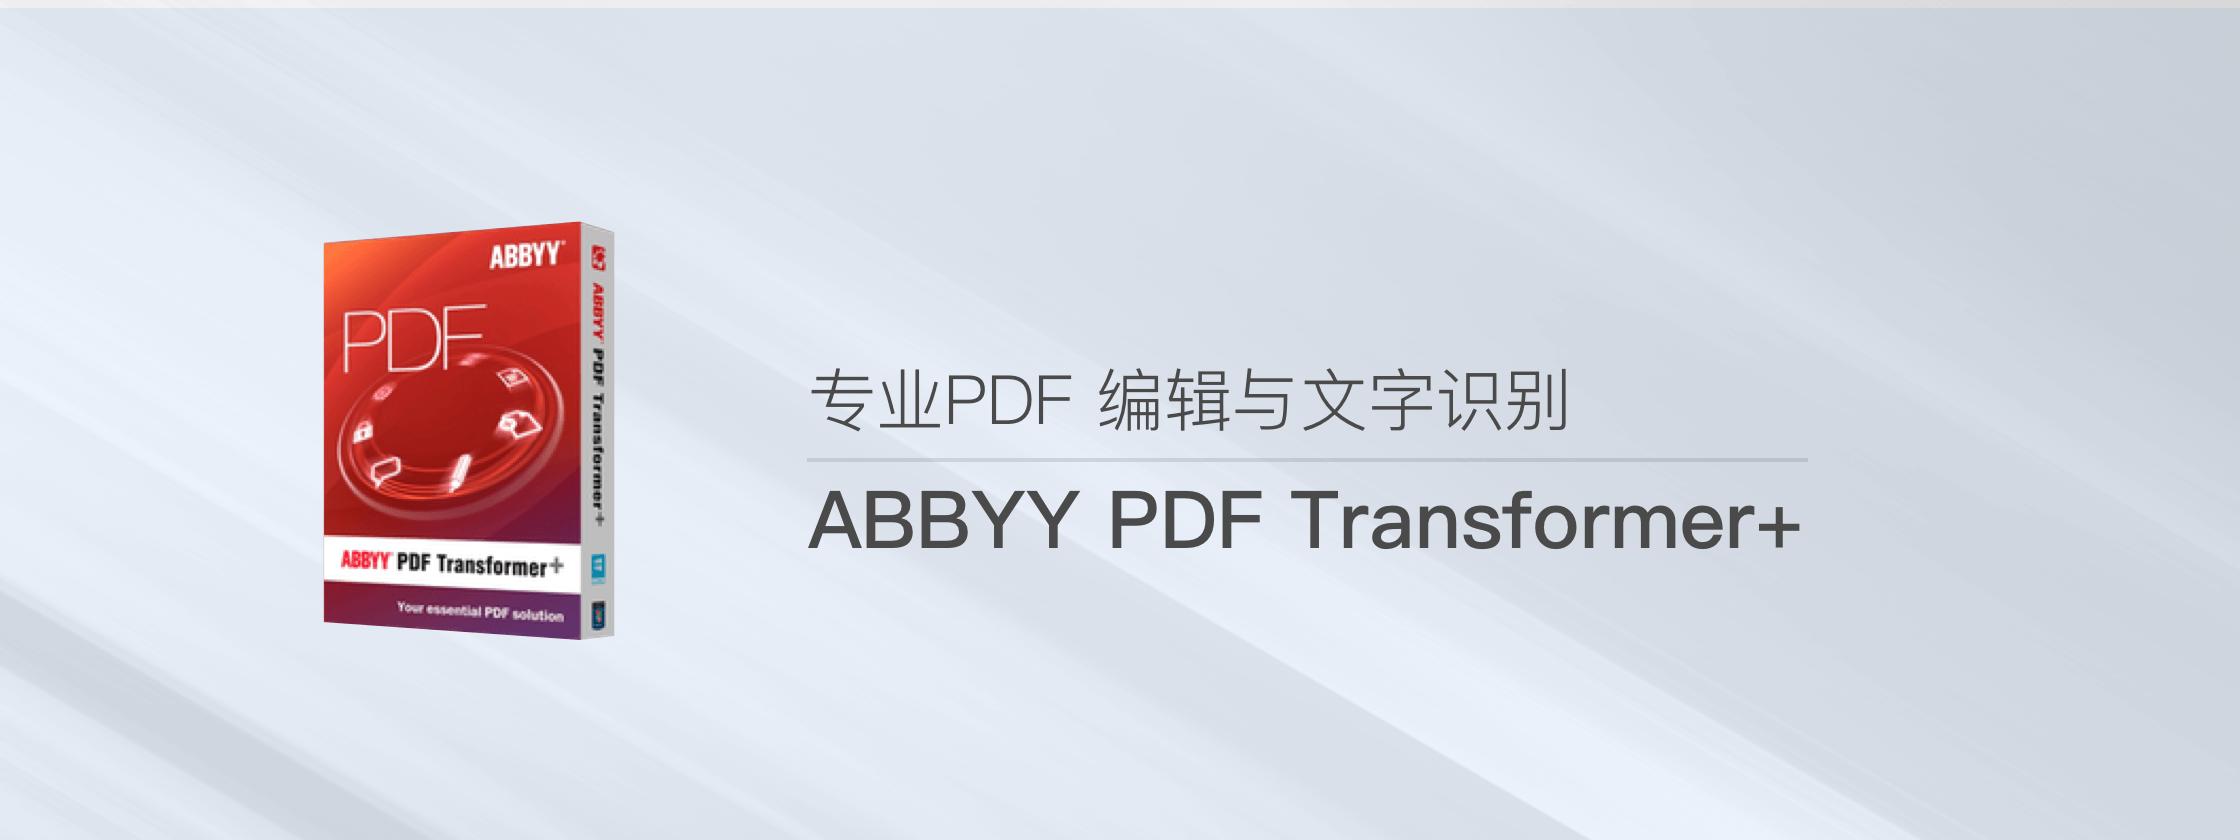 ABBYY PDF Transformer+ 中国版 – 专业PDF 编辑与文字识别